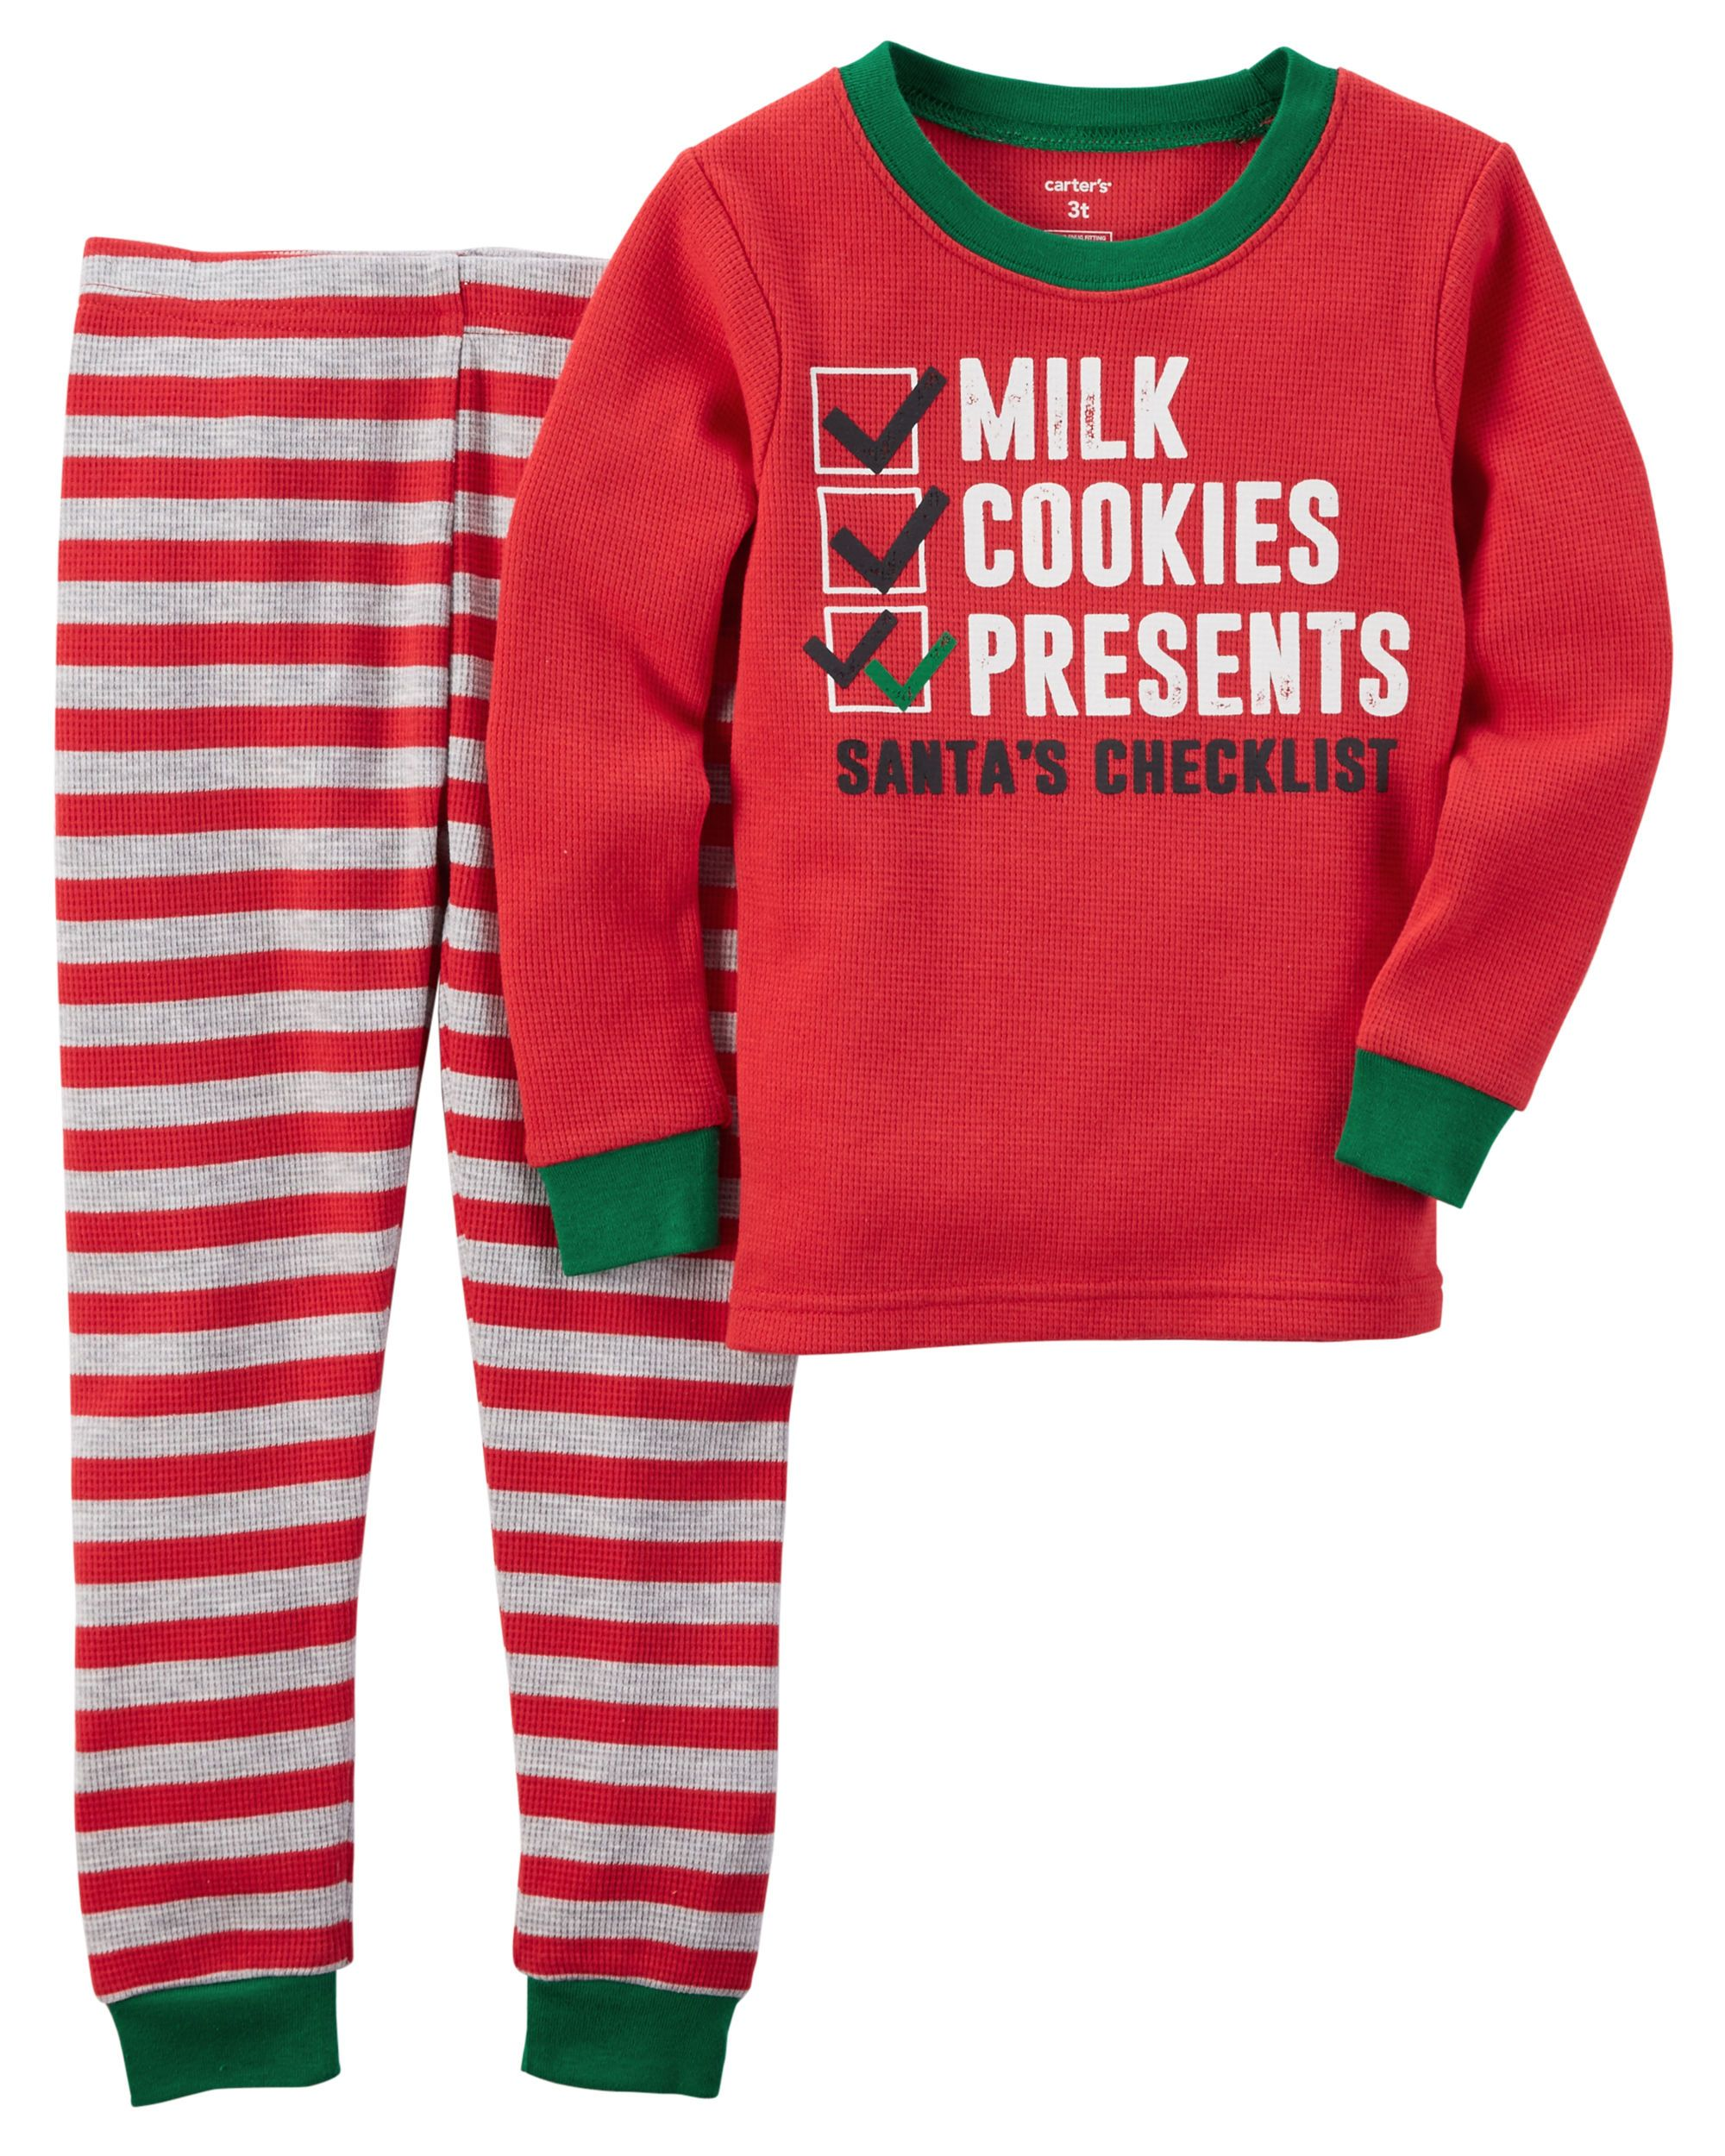 602675db6 Toddler Boy 2-Piece Snug Fit Cotton Christmas PJs   Carters.com ...